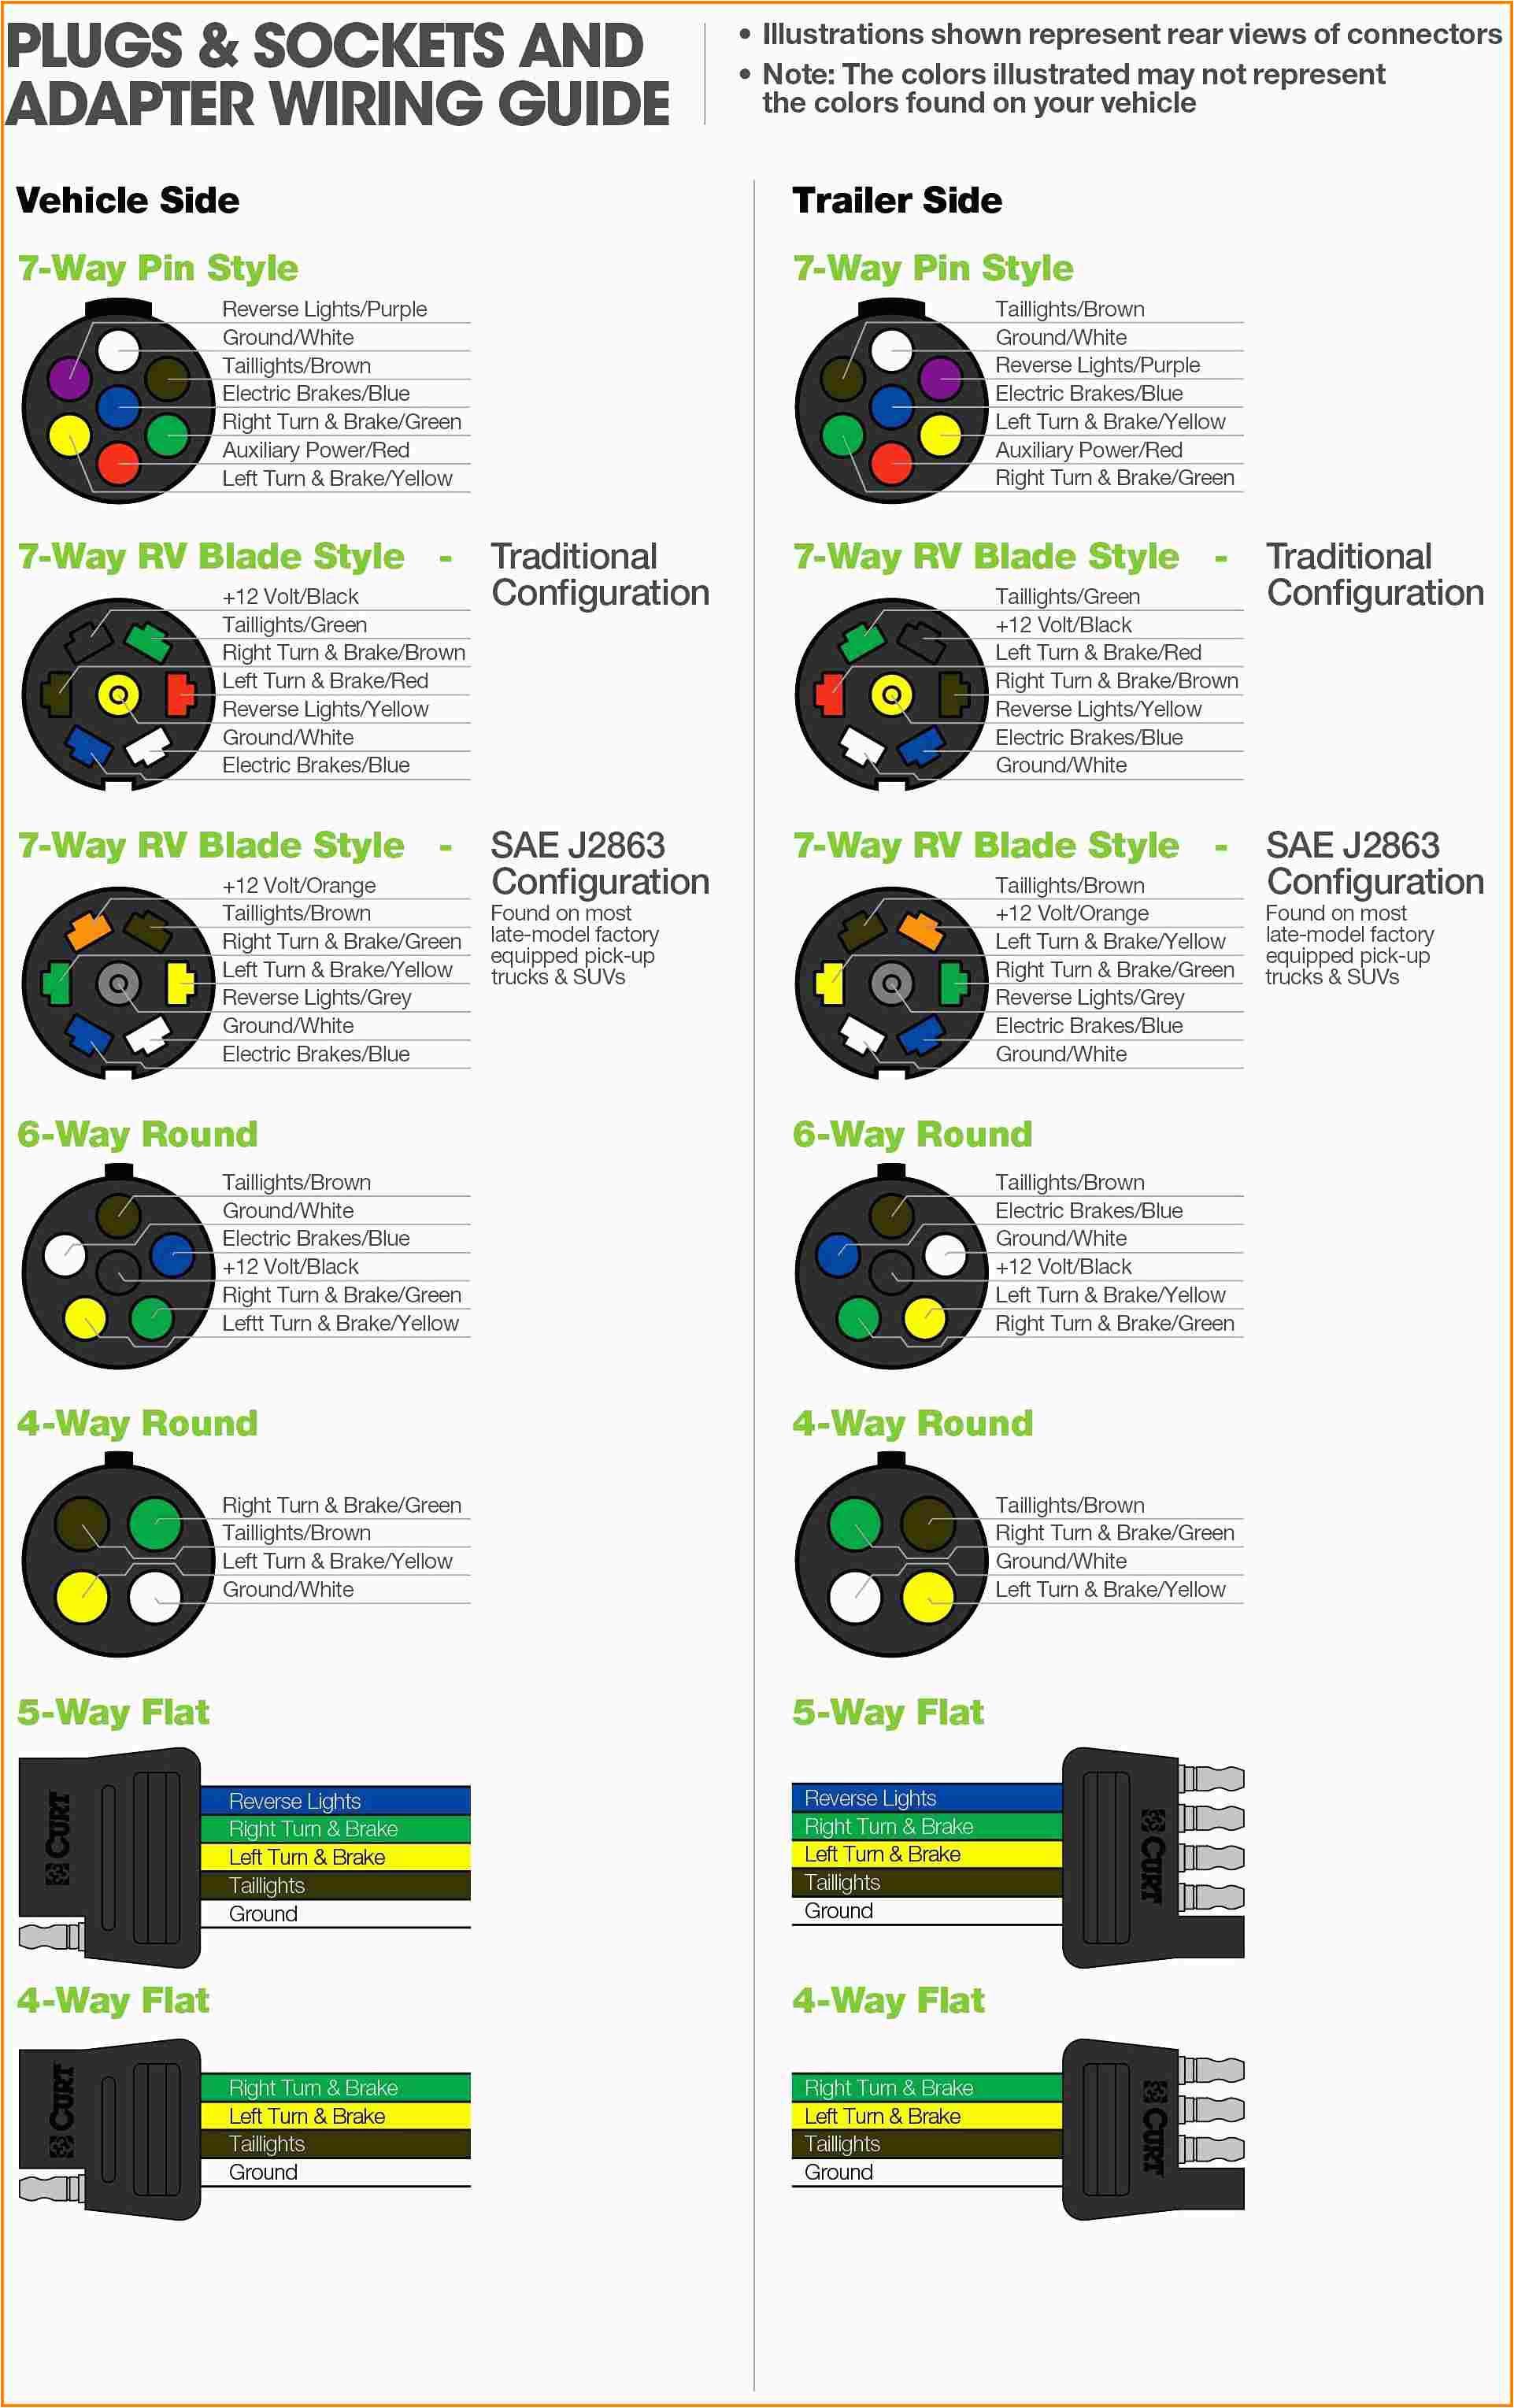 7 Pin Trailer Wiring Harness Diagram 6 Pin Round Trailer Wiring Diagram Free Download Wiring Diagram